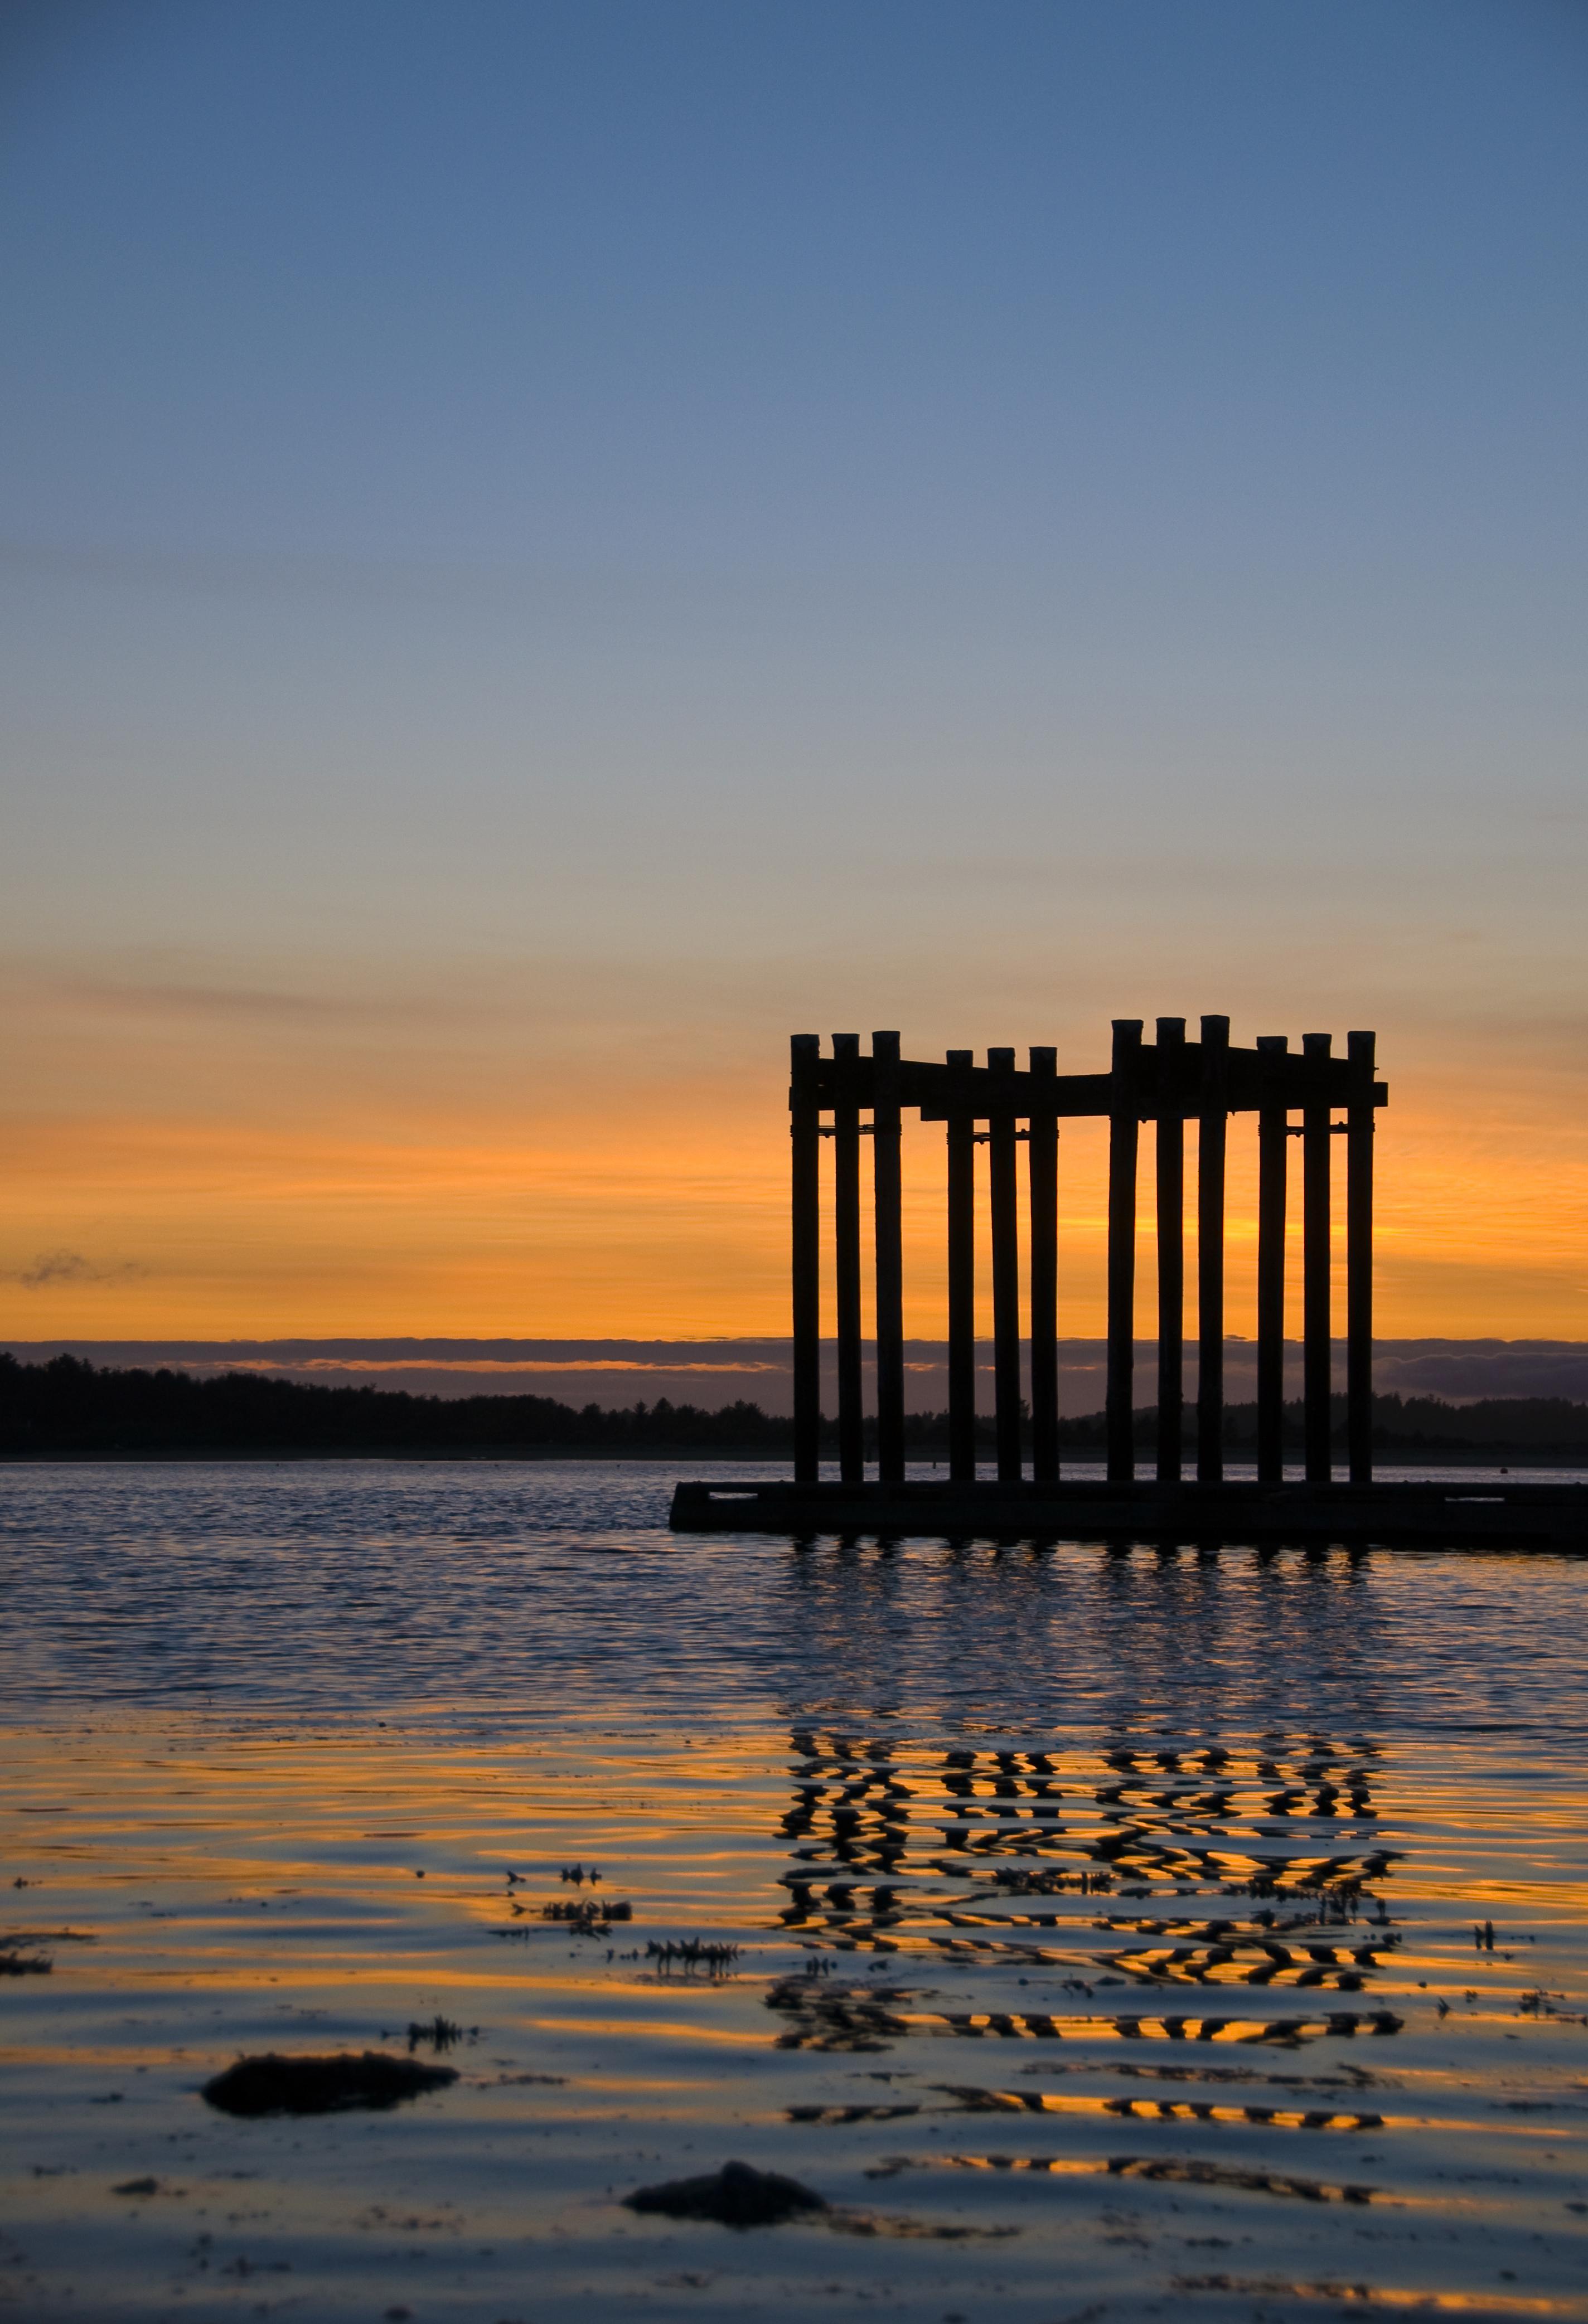 Sunset with Dock Pillars